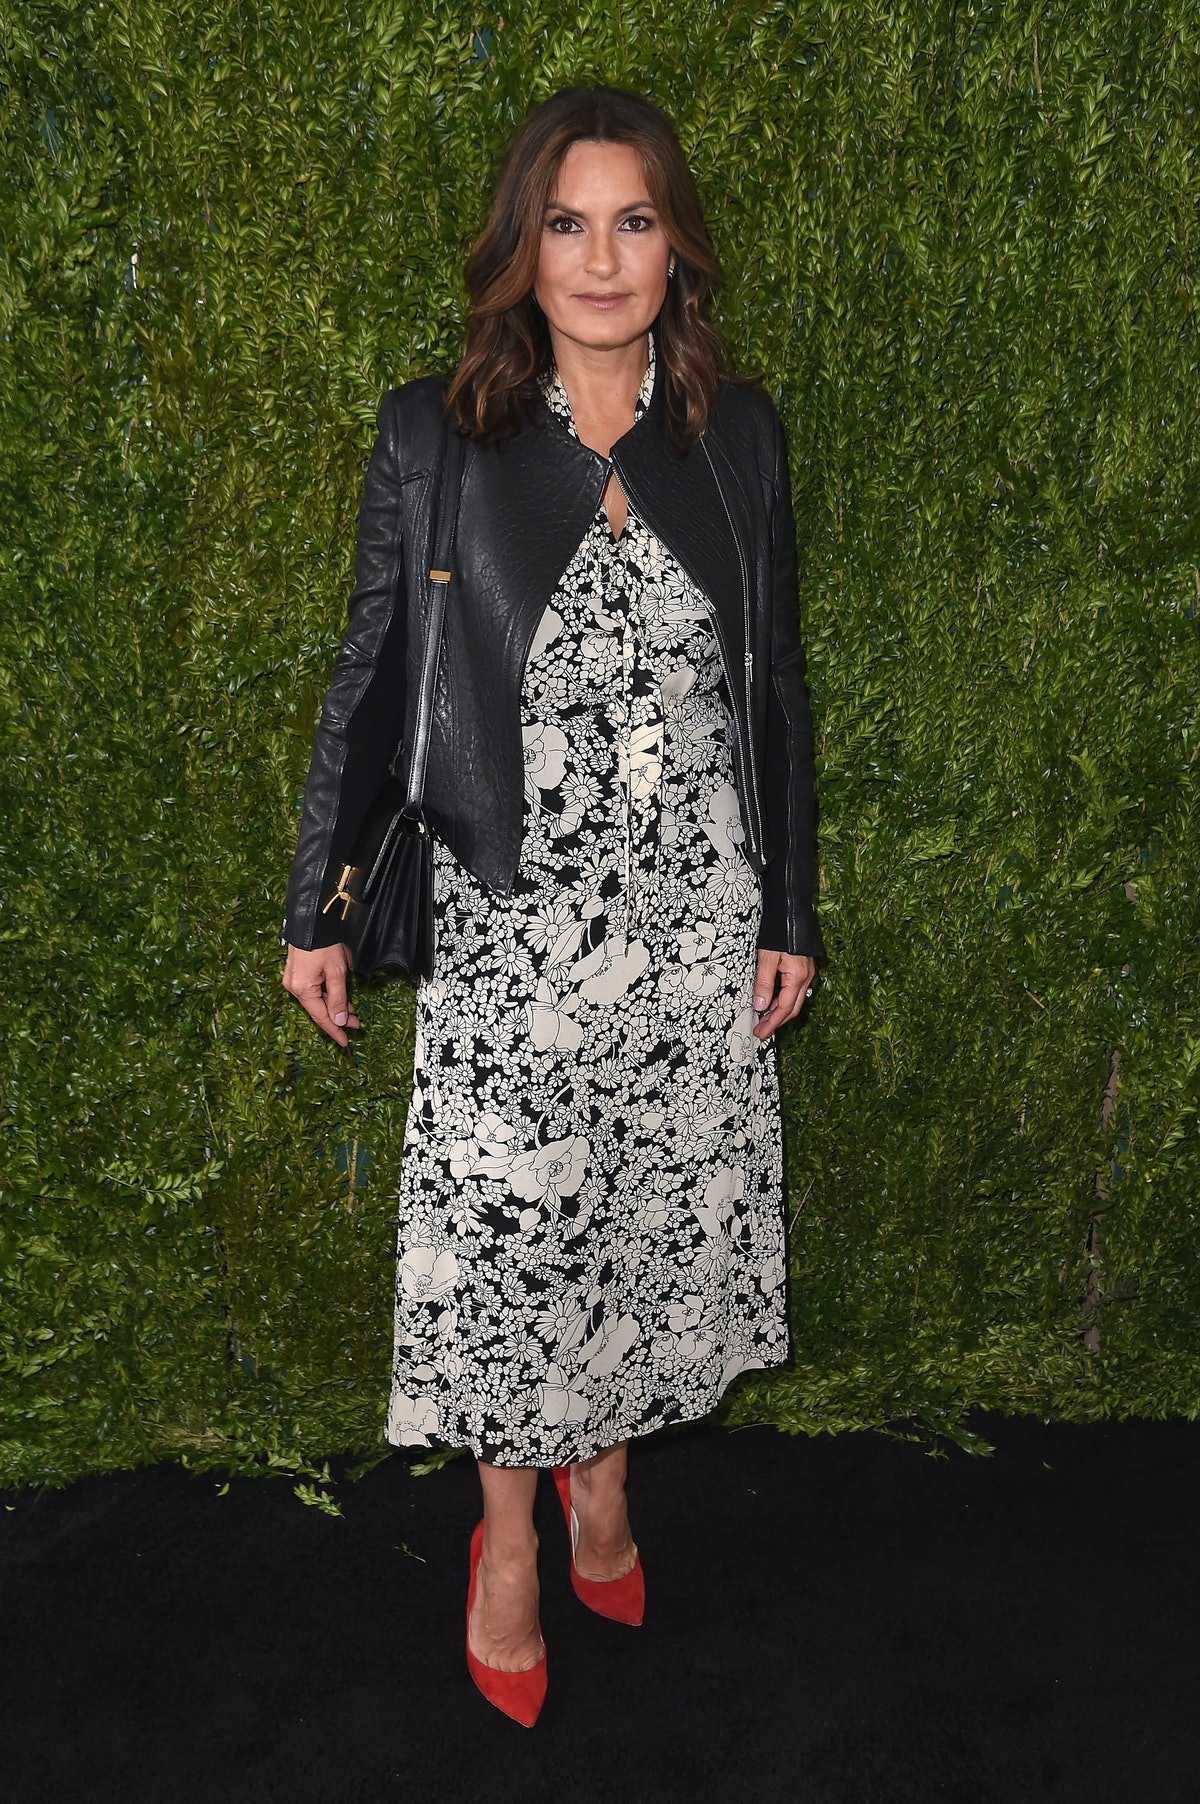 CHANEL Tribeca Film Festival Women's Filmmaker Luncheon - Arrivals